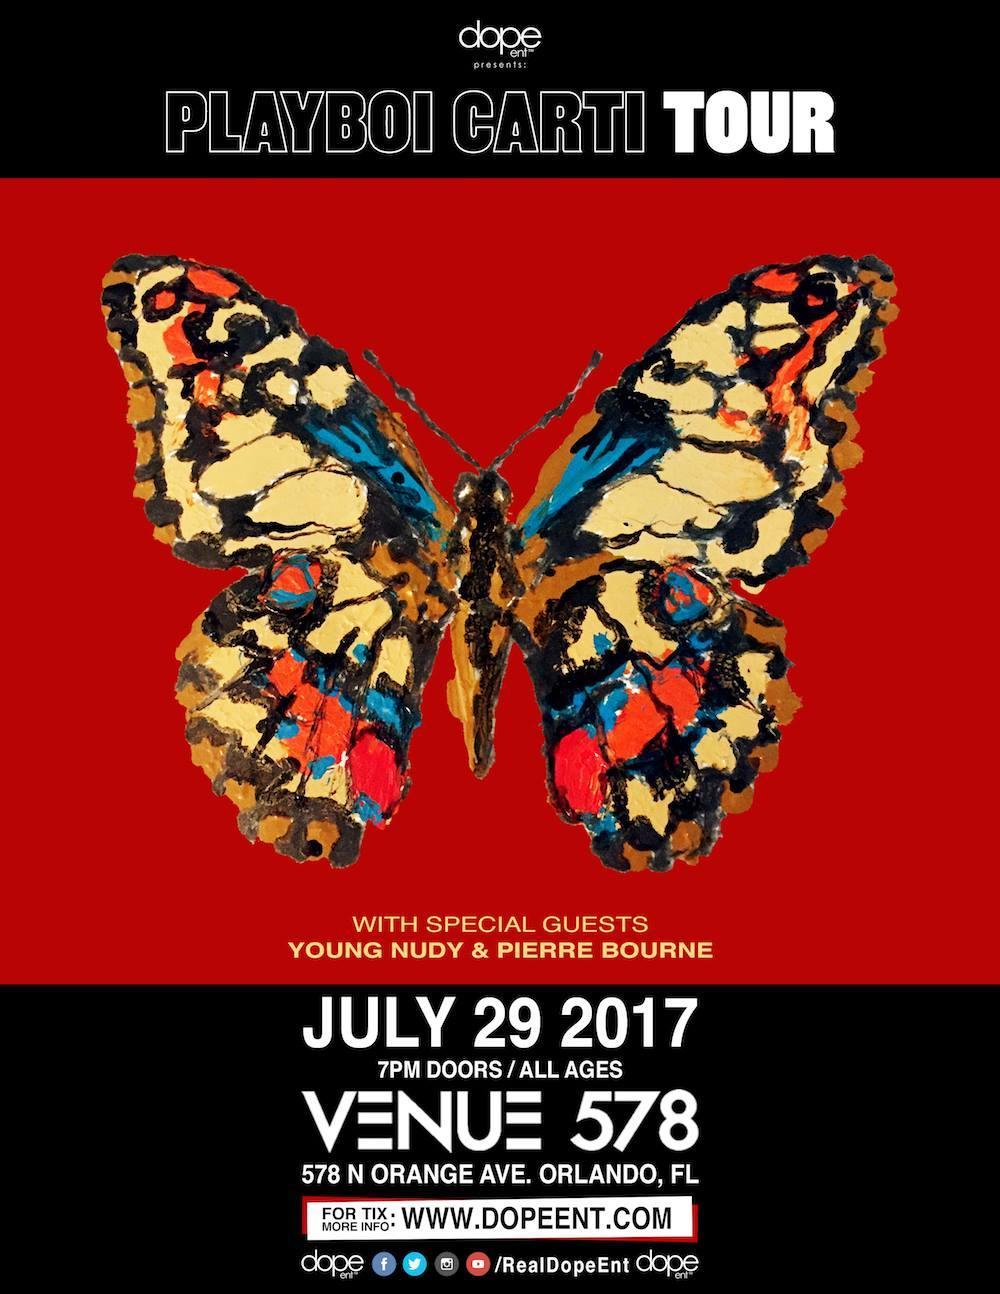 Playboi Carti Tour Live at Venue 578 | 07.29.17